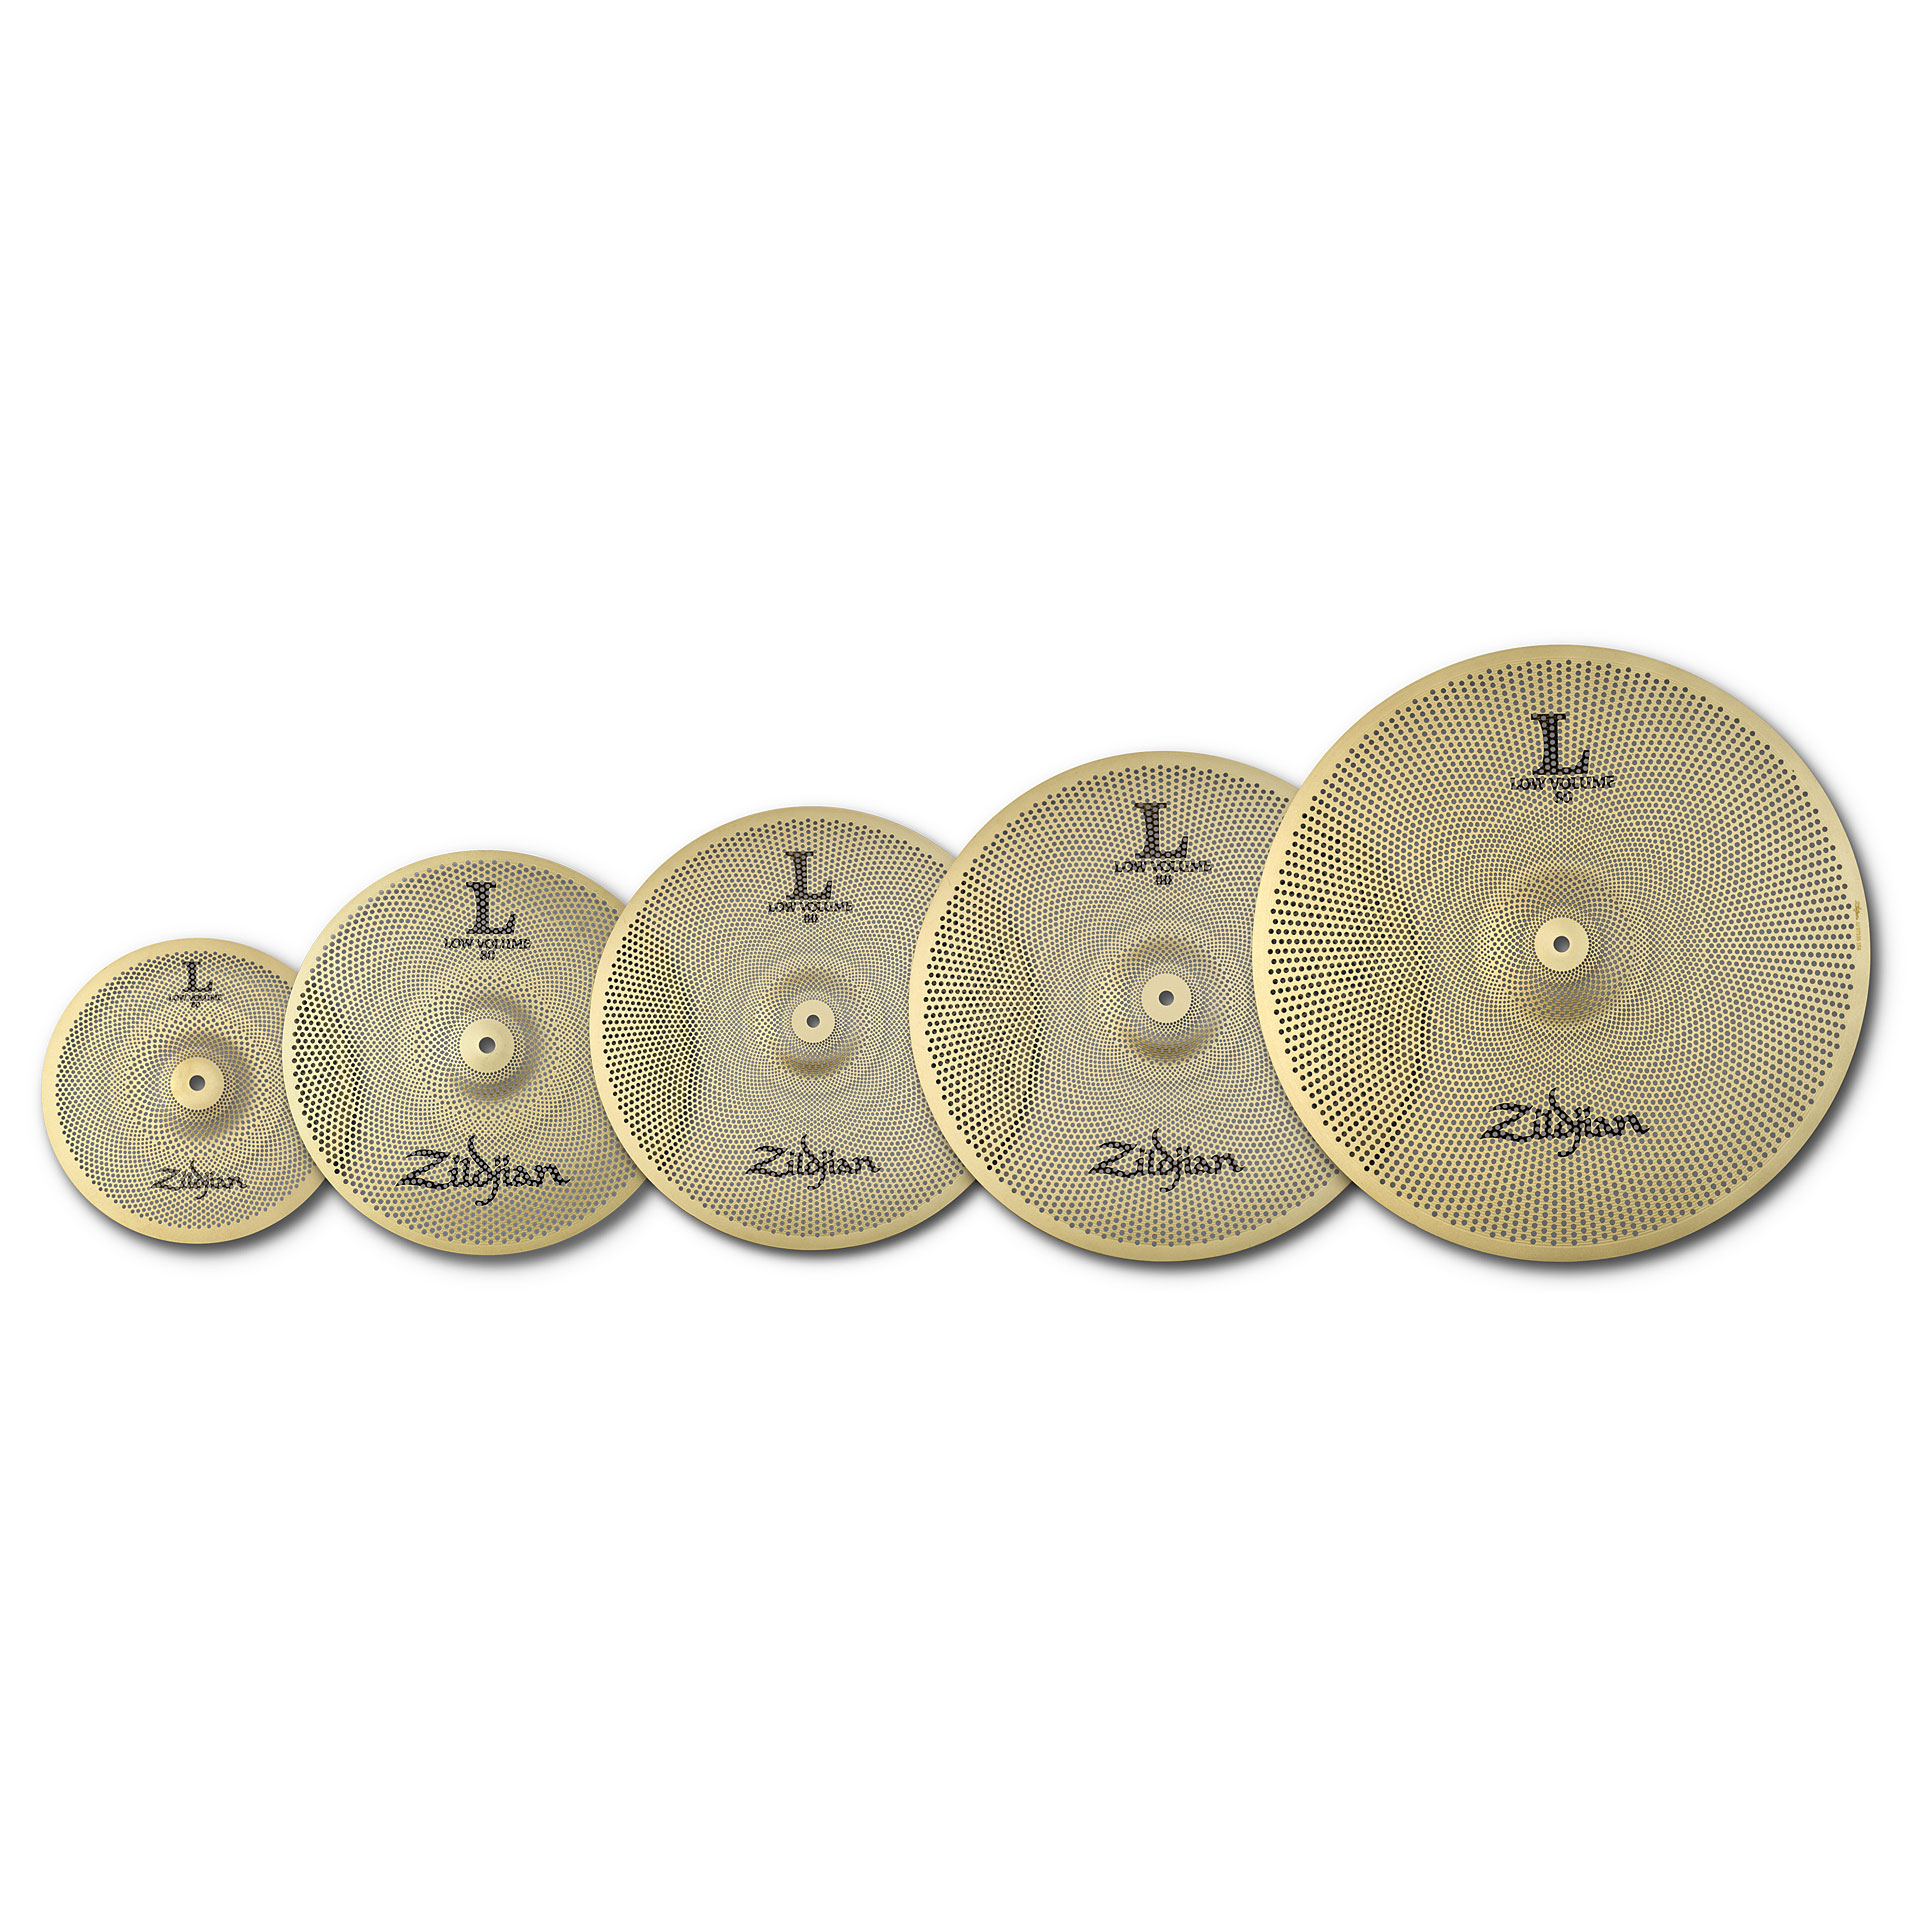 zildjian l80 low volume 468 full pack 10 14 16 18 20 cymbal set. Black Bedroom Furniture Sets. Home Design Ideas